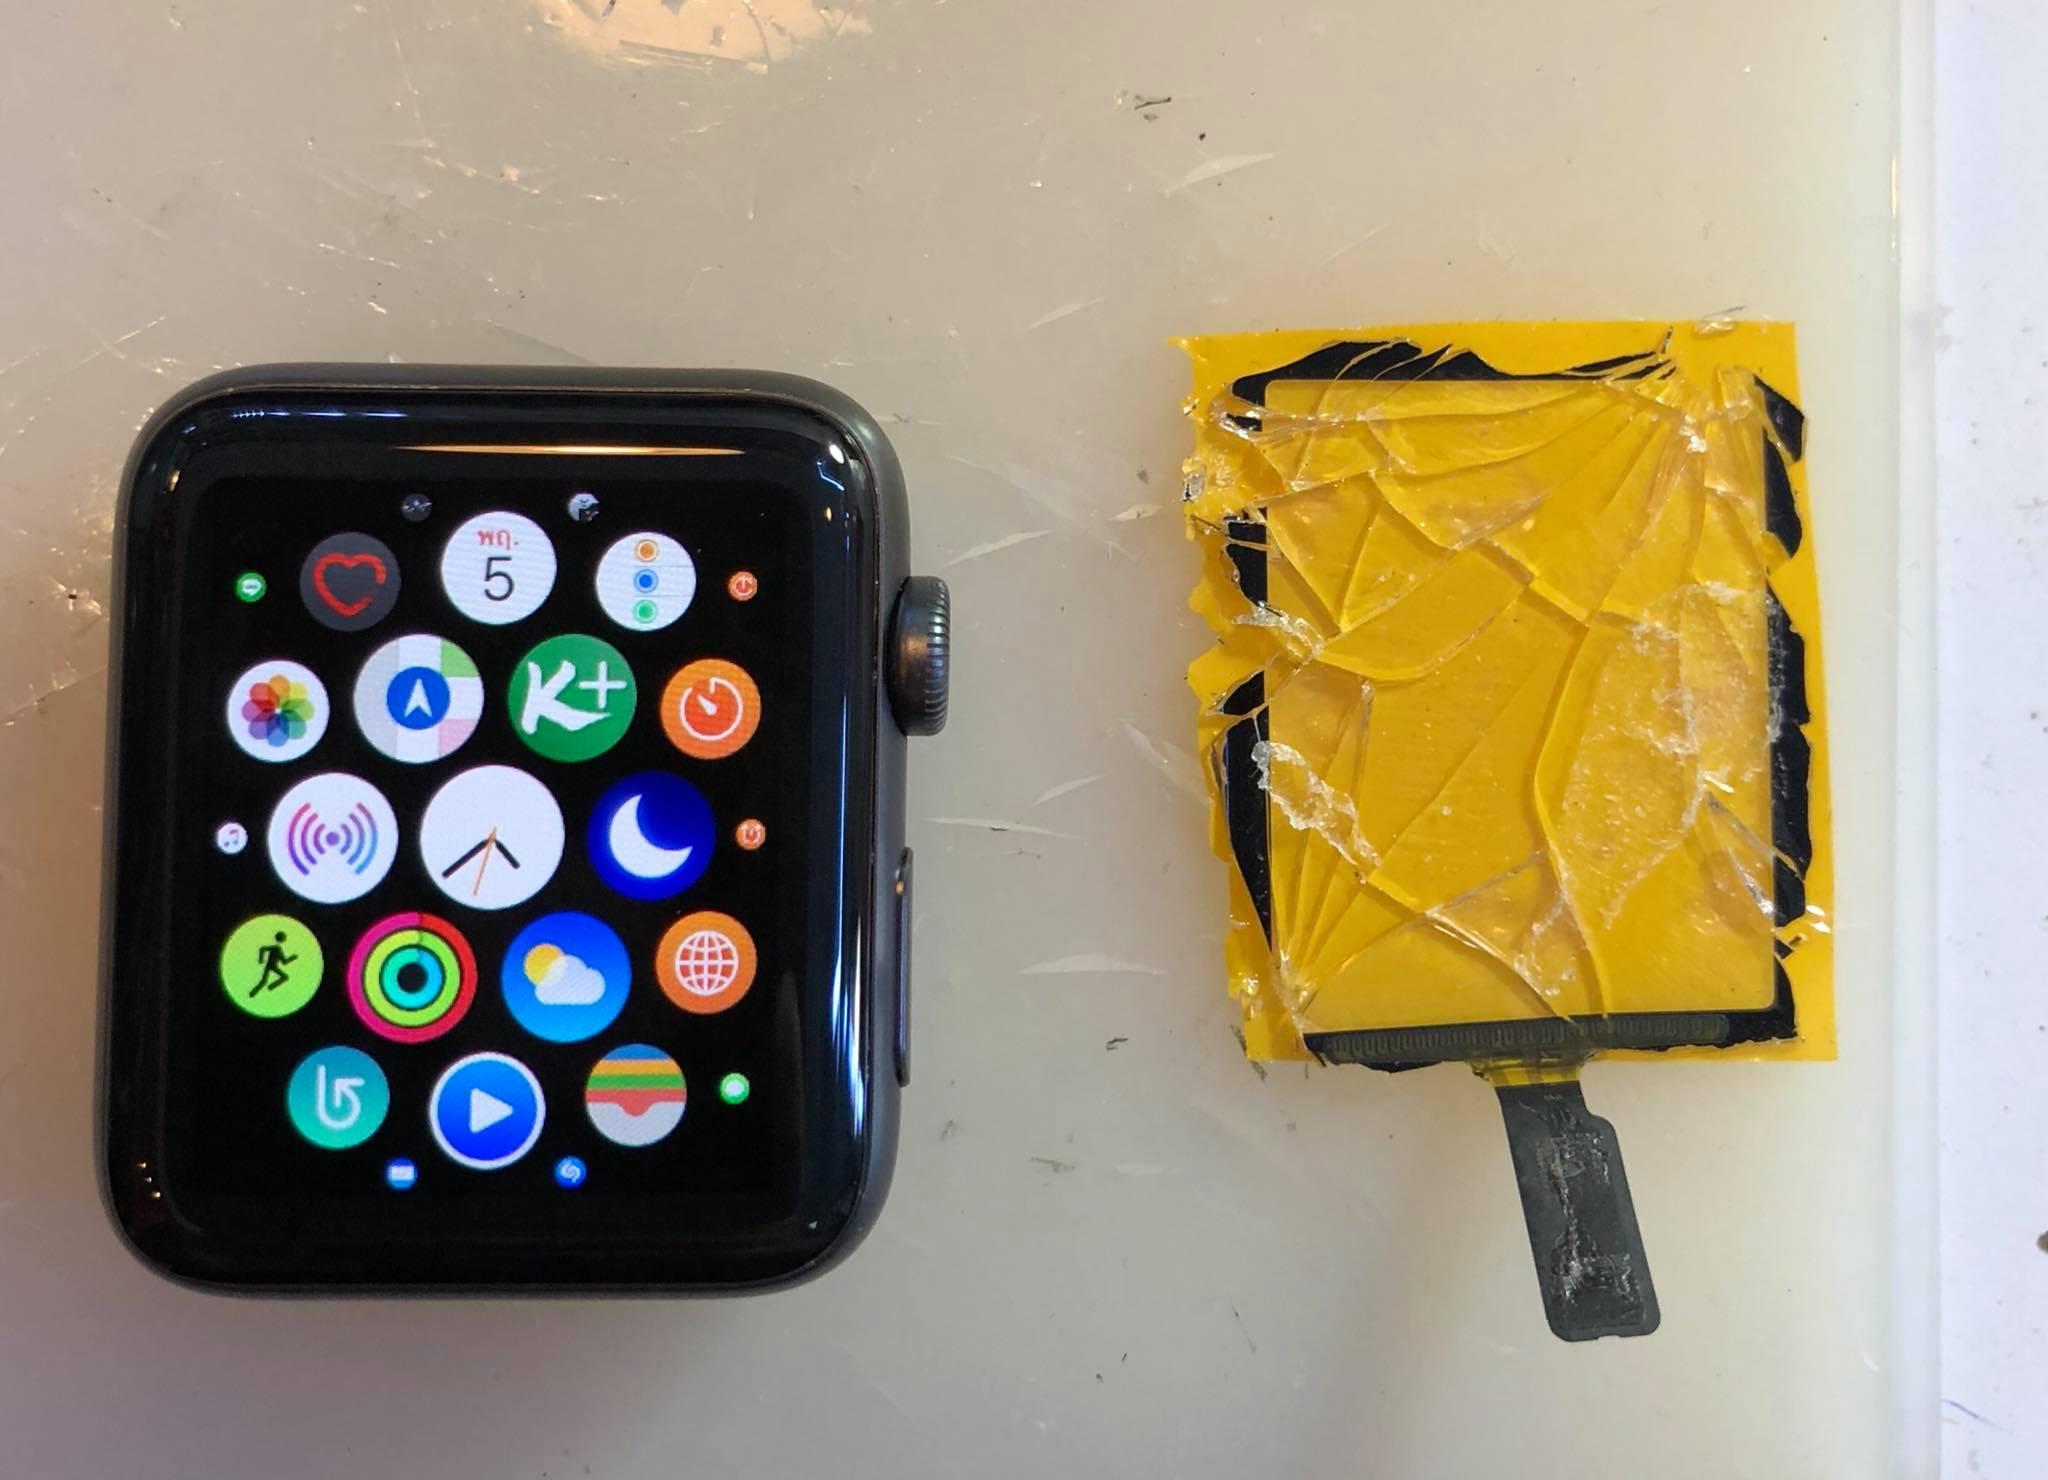 Apple Watch (แอปเปิ้ลวอช) series 5 จอแตก เปลี่ยนร้านไหนดี ไม่ต้องรอ